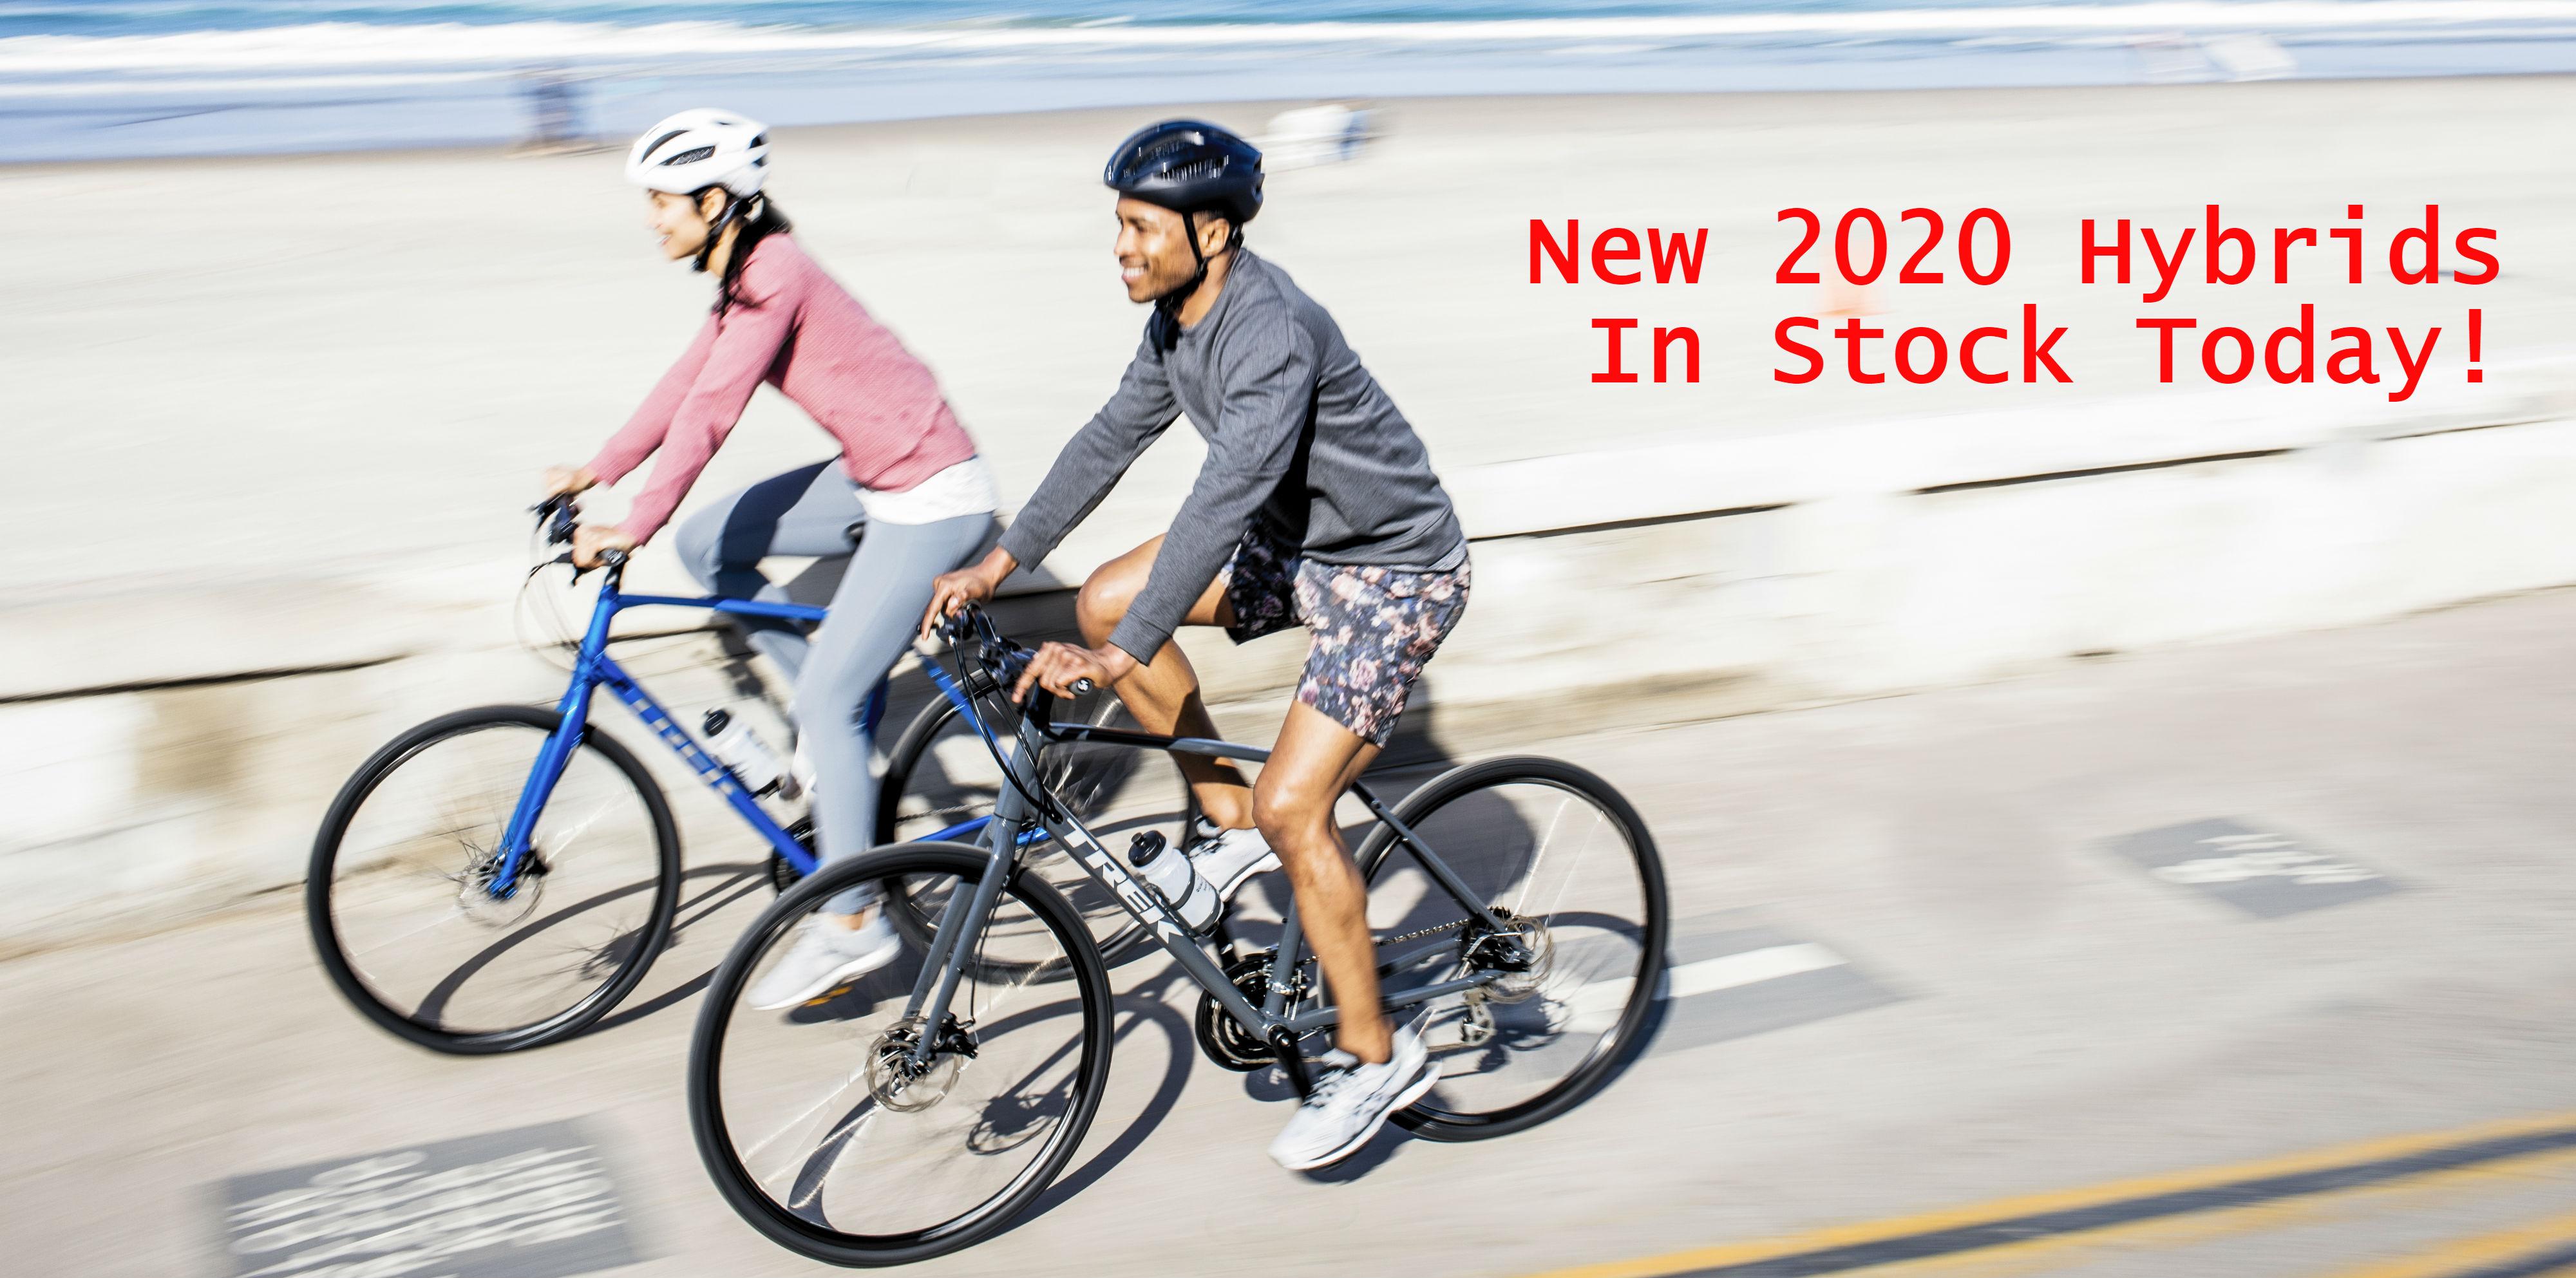 Bike Shop   Wayfarer Bicycle   Since 1972